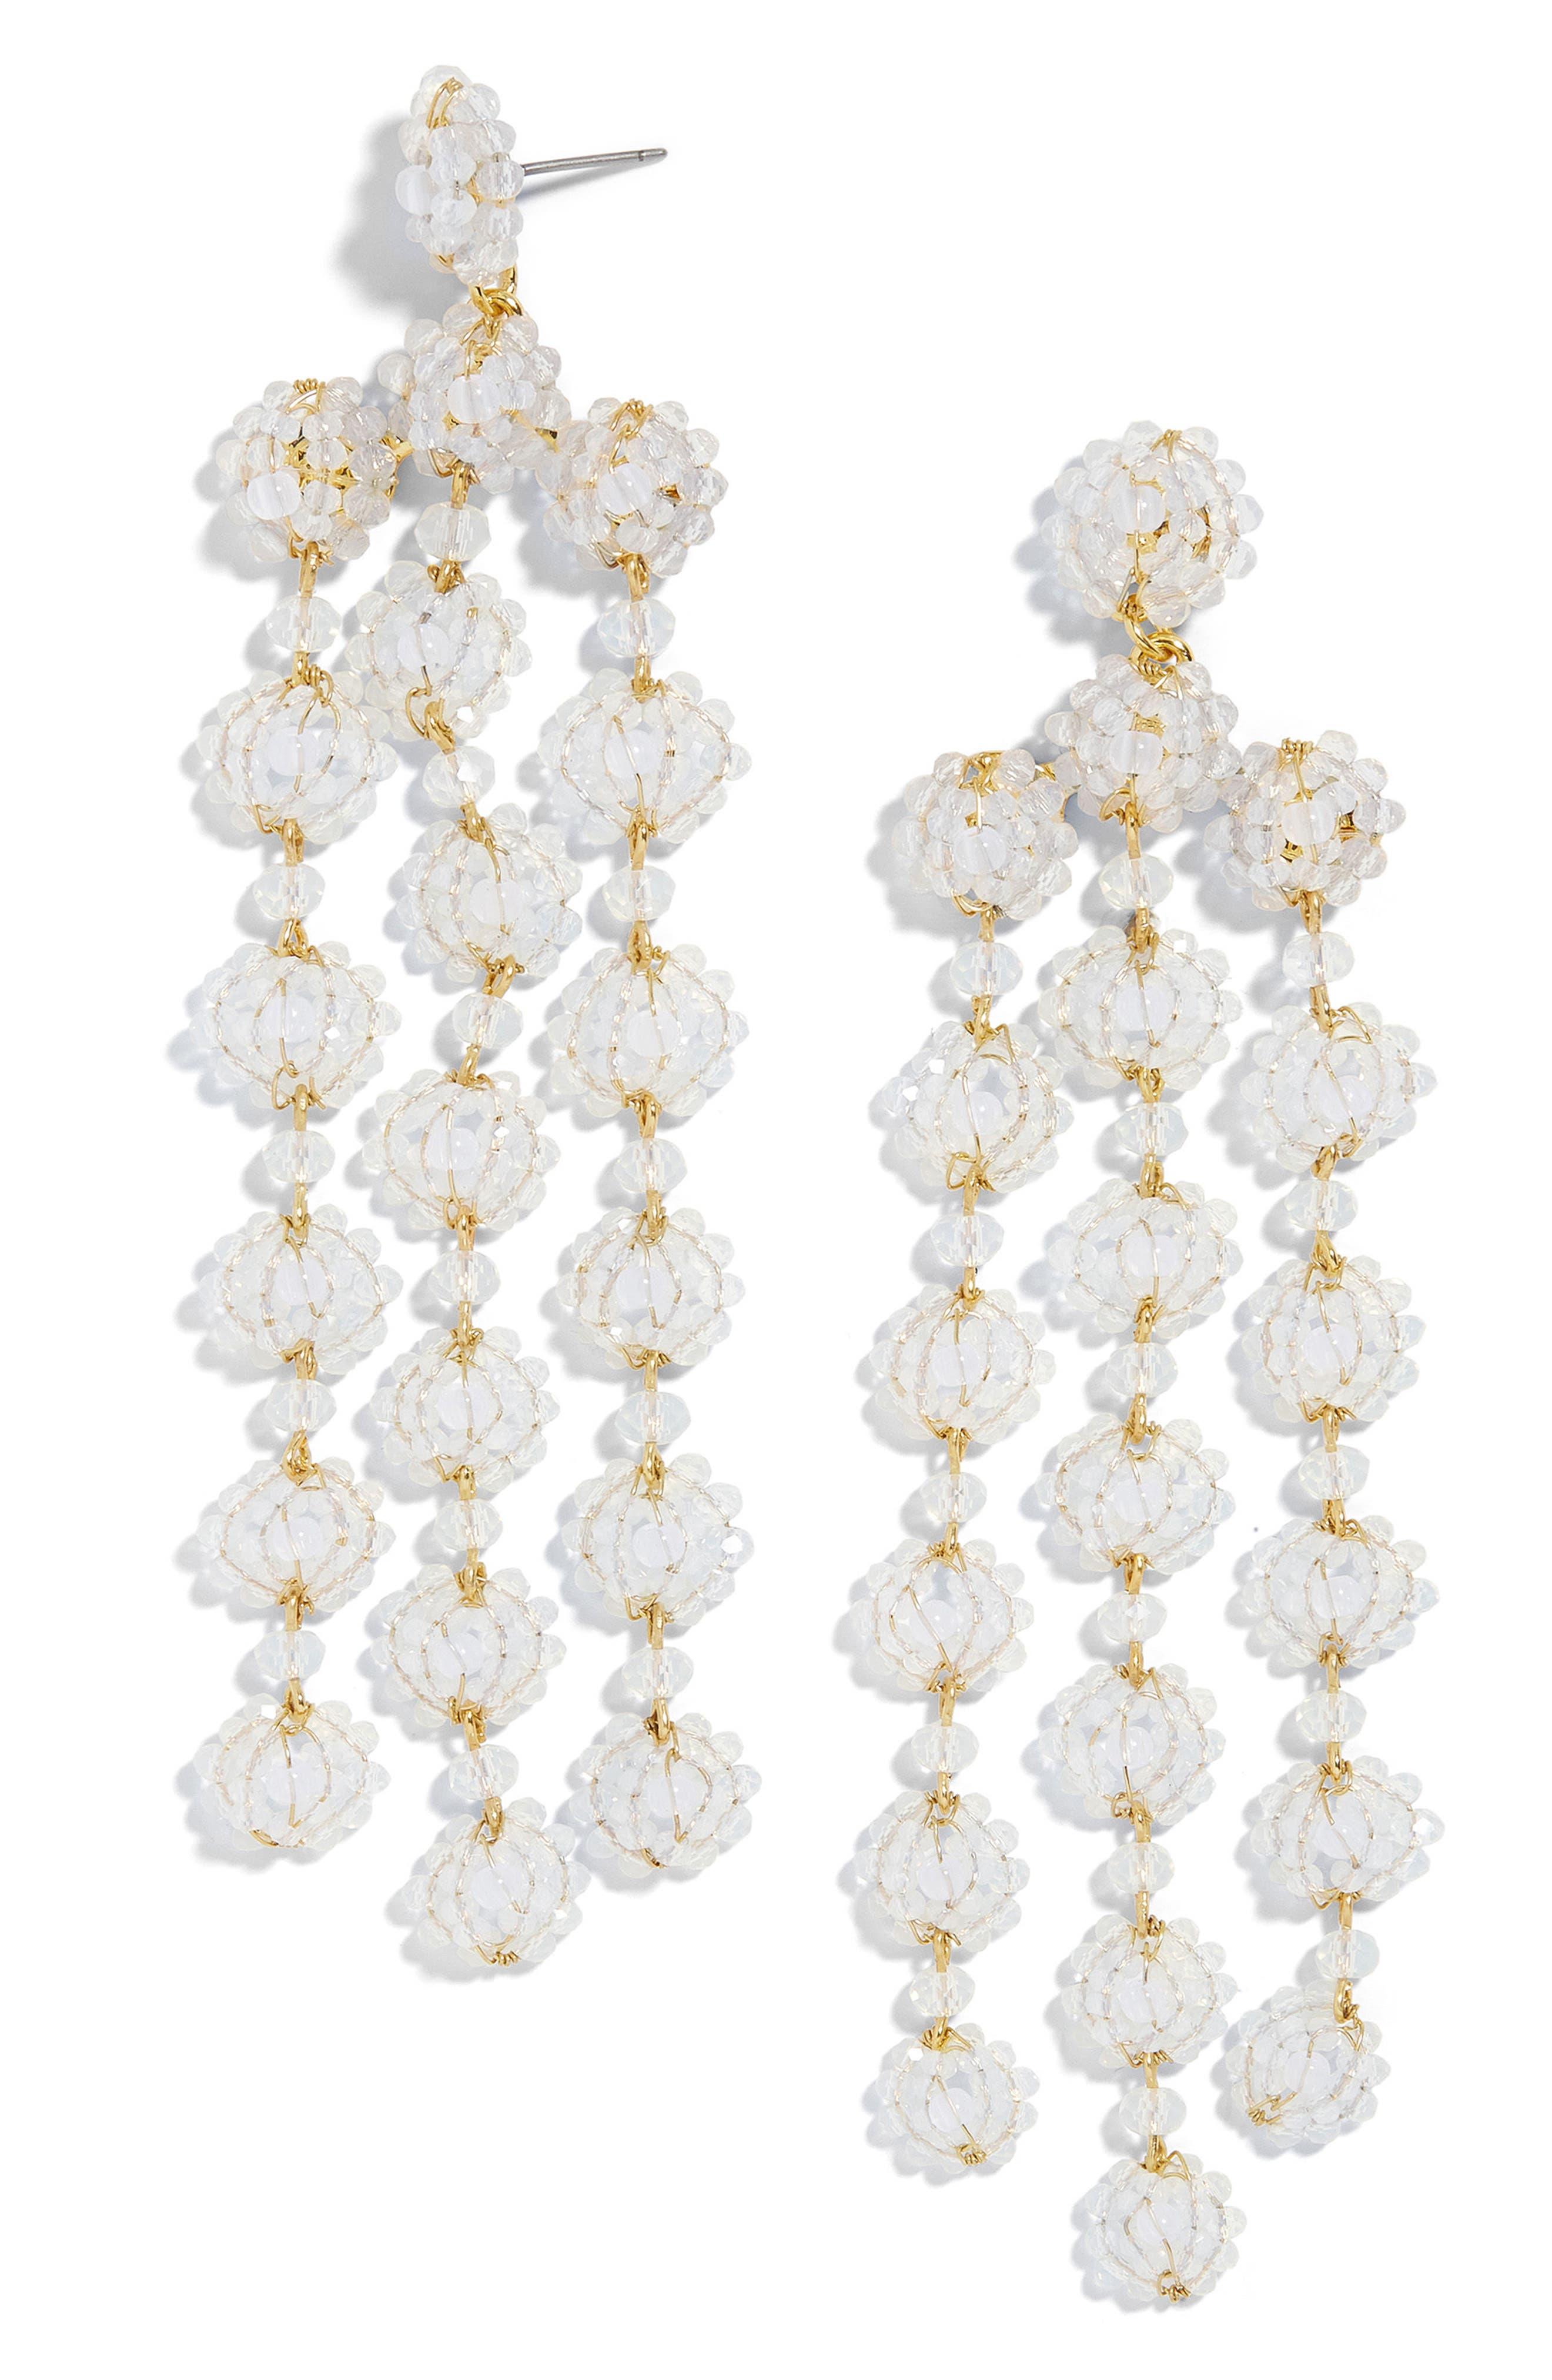 Shiori Beaded Chandelier Earrings,                         Main,                         color, White